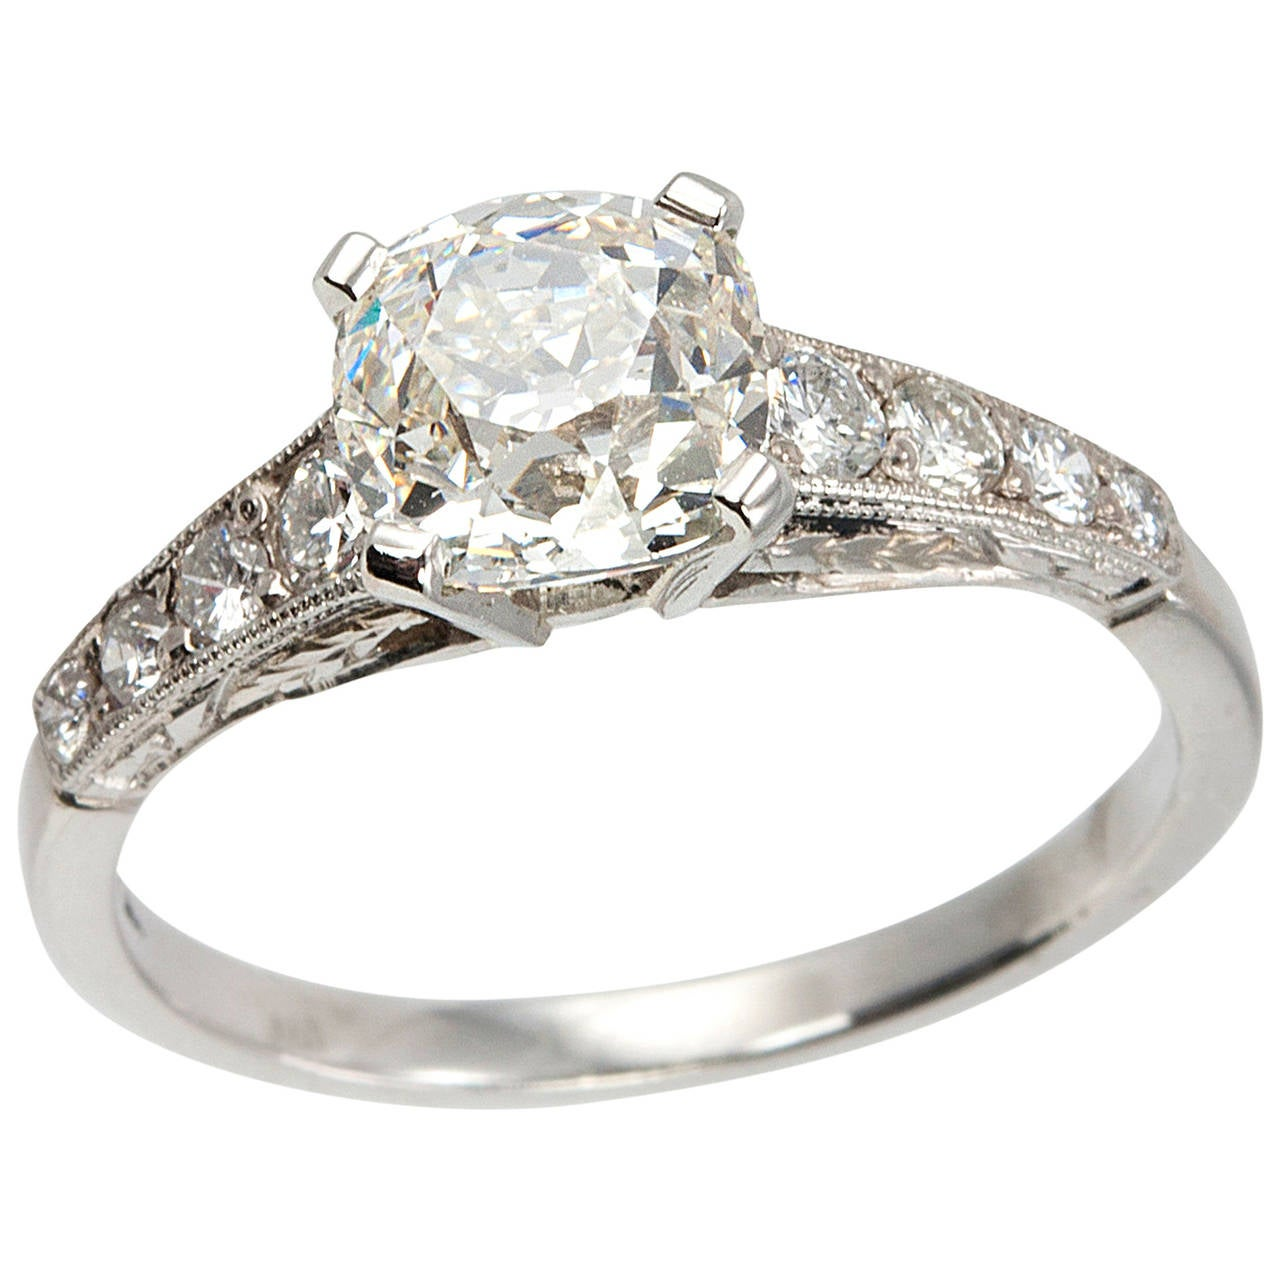 1 55 Carat Cushion Cut Diamond and Platinum Engagement Ring at 1stdibs